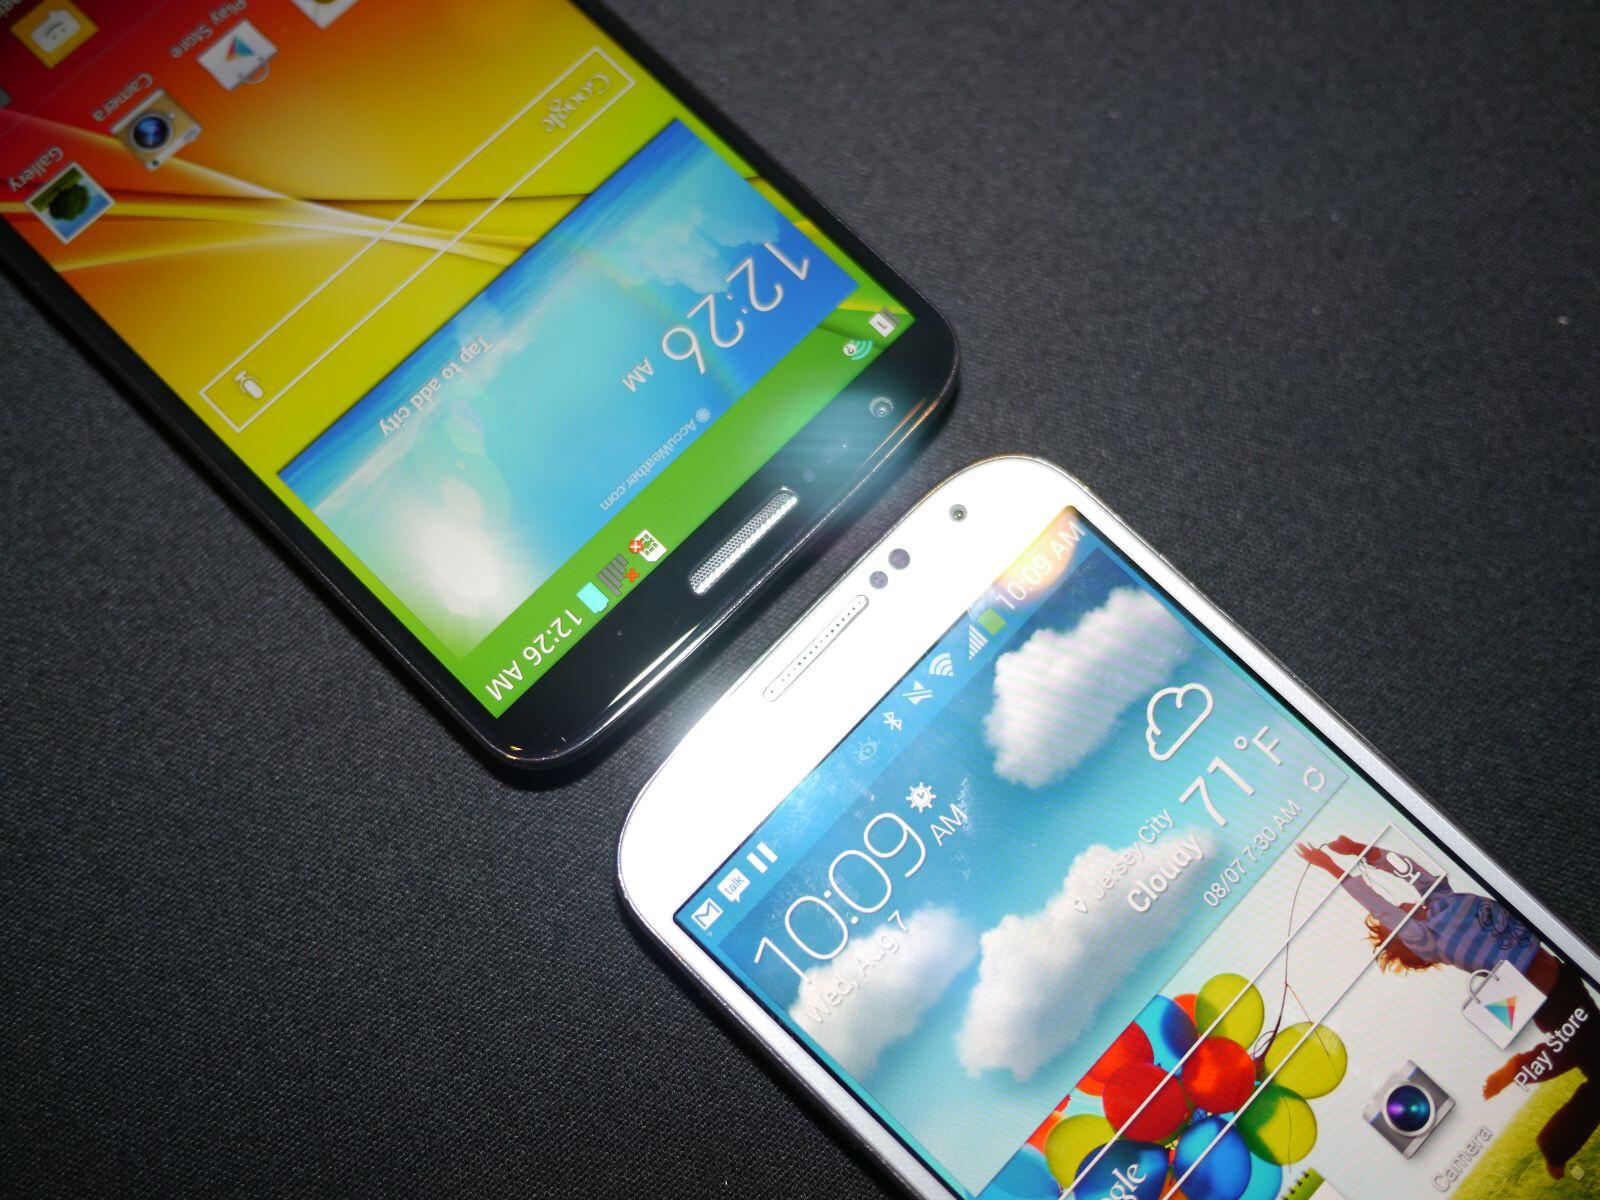 LG G2 VS Galaxy S4